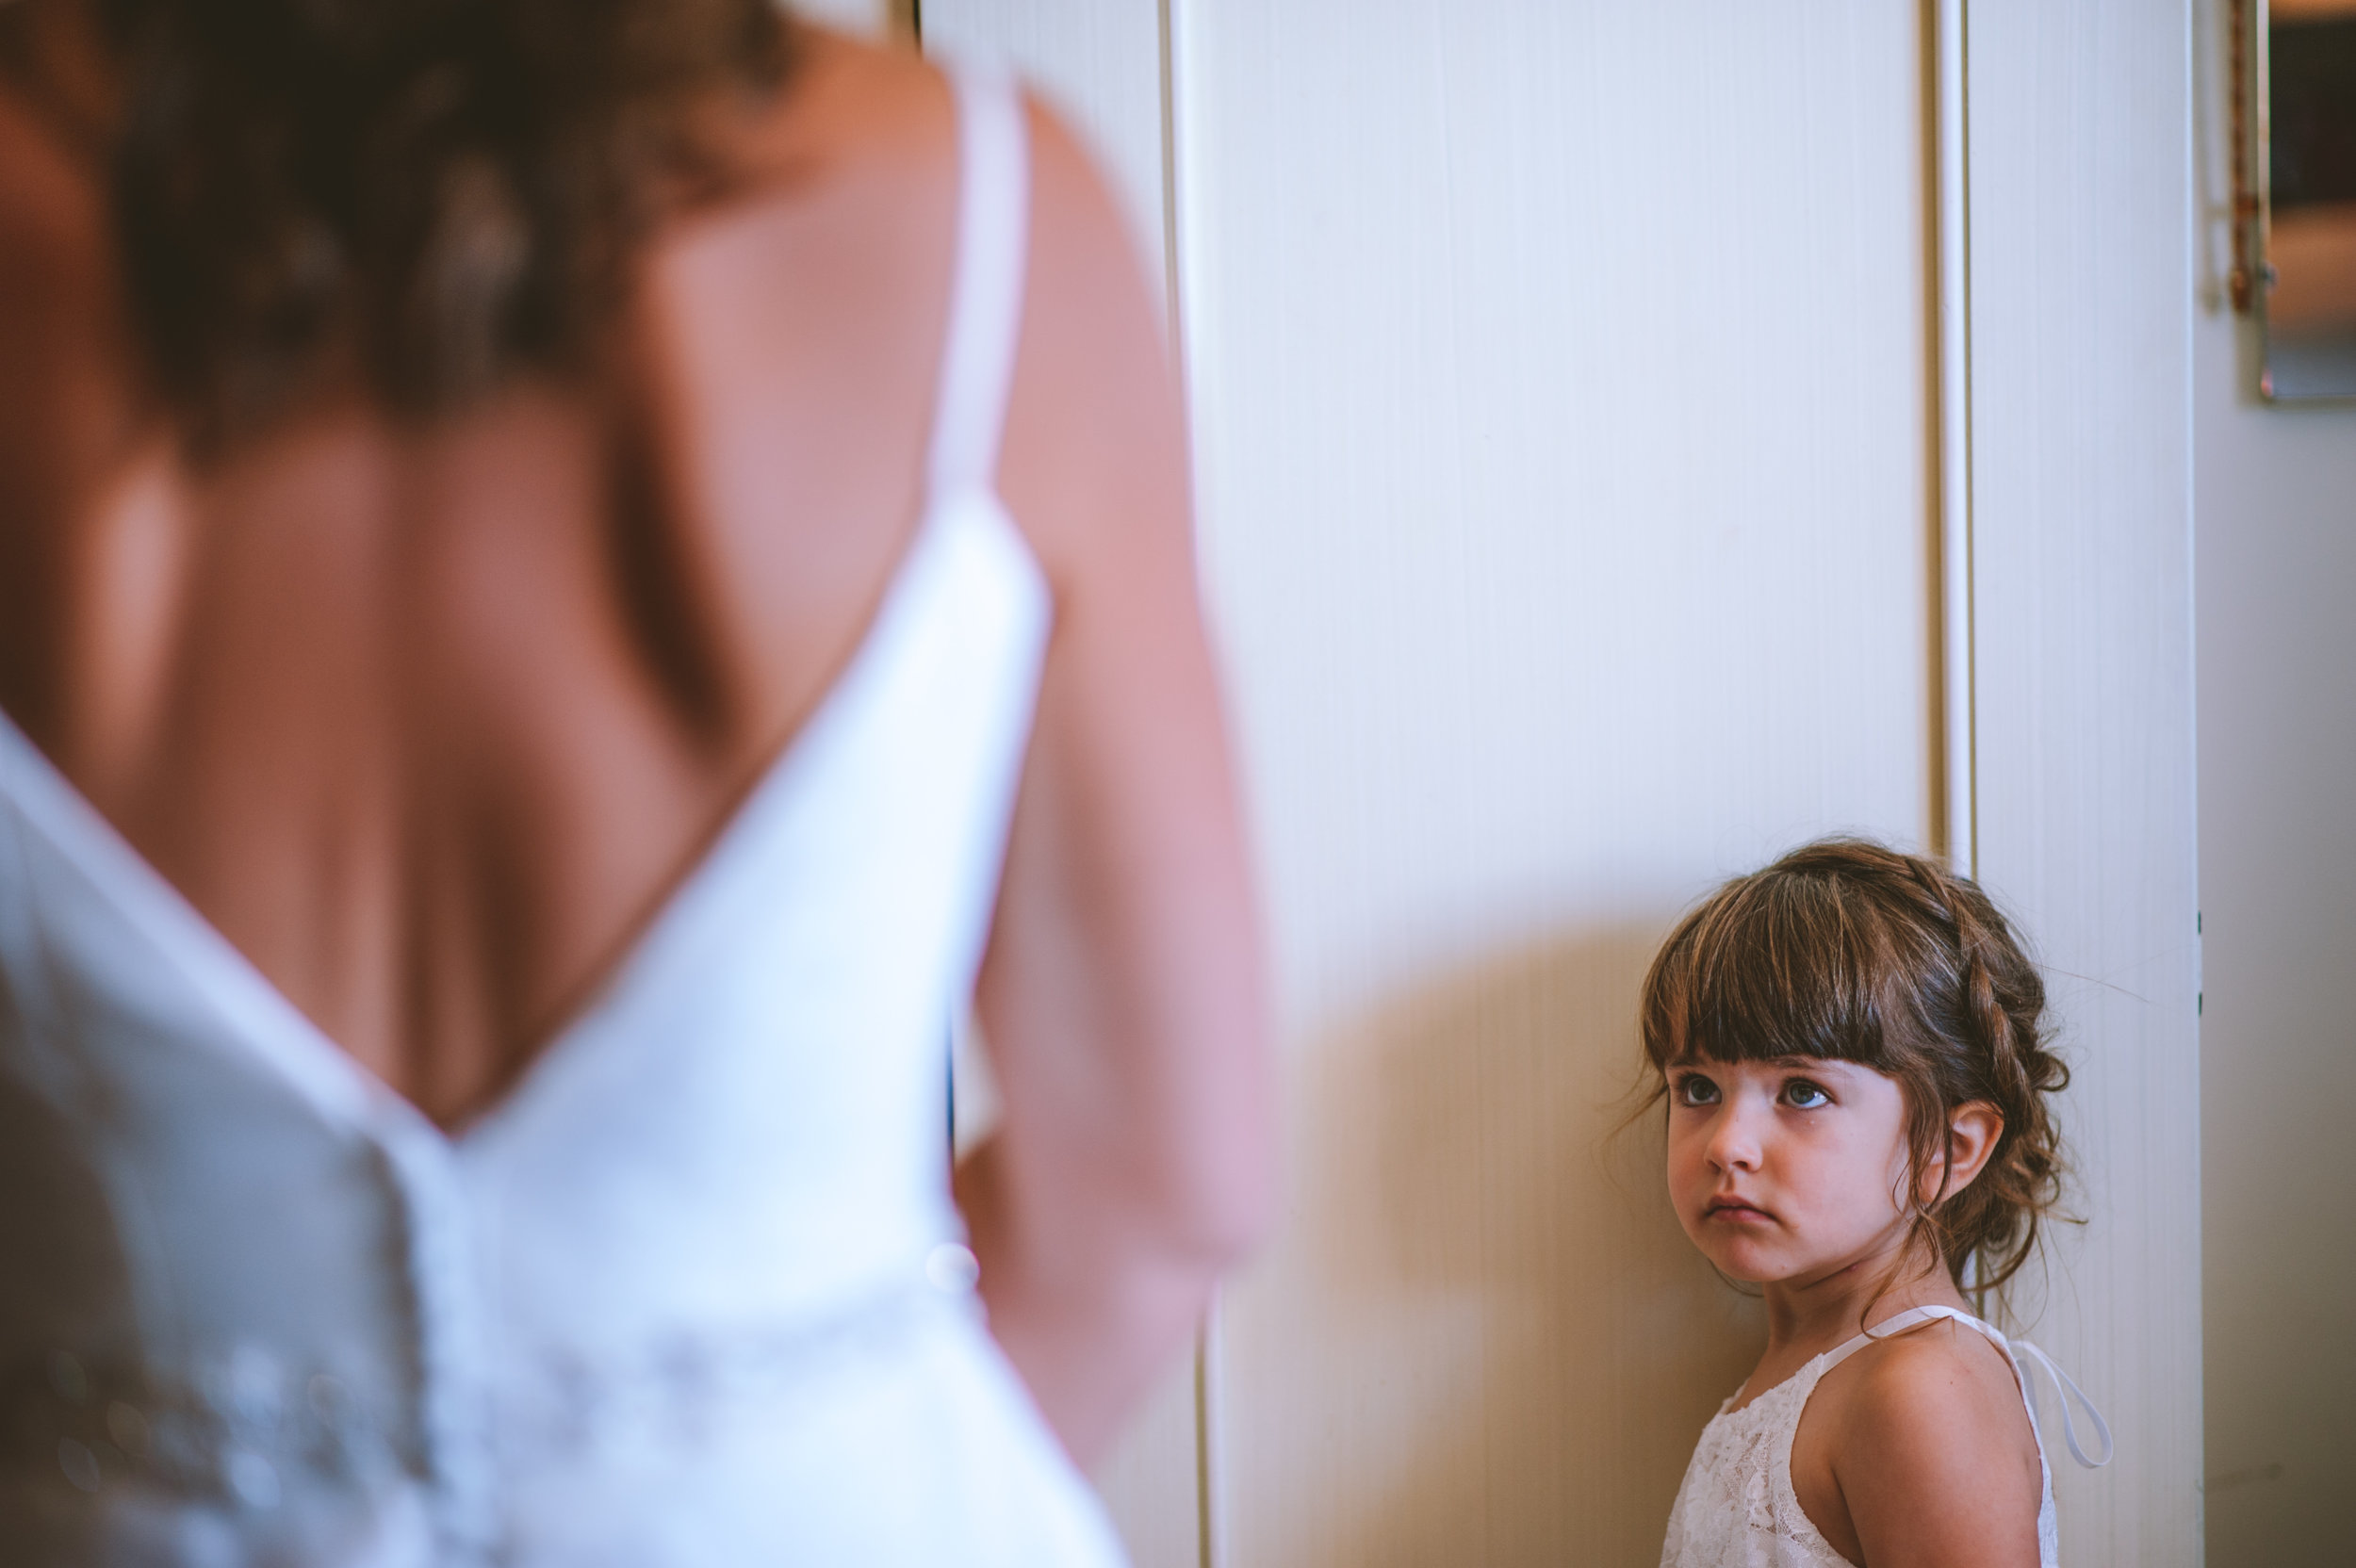 ash-barton-estate-wedding-photographer-mark-shaw-14.jpg